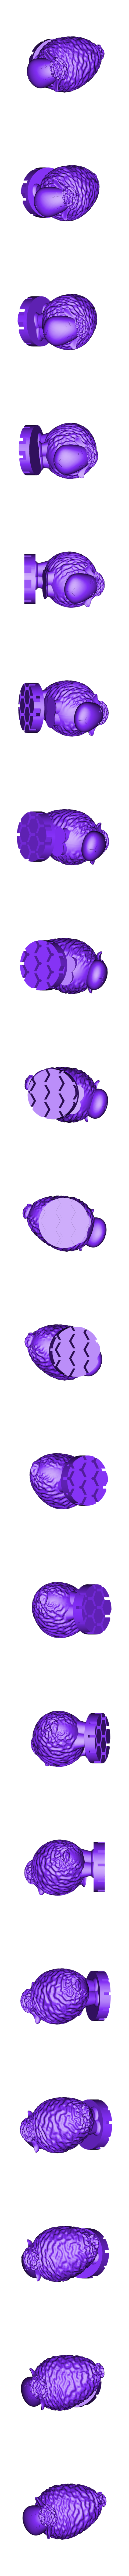 Zoetrope_Prusament Spool_by Dominik Cisar_Sheep 09.stl Download free STL file SPIROGRAPH - PRUSAMENT SPOOL - reuse idea • 3D print model, cisardom